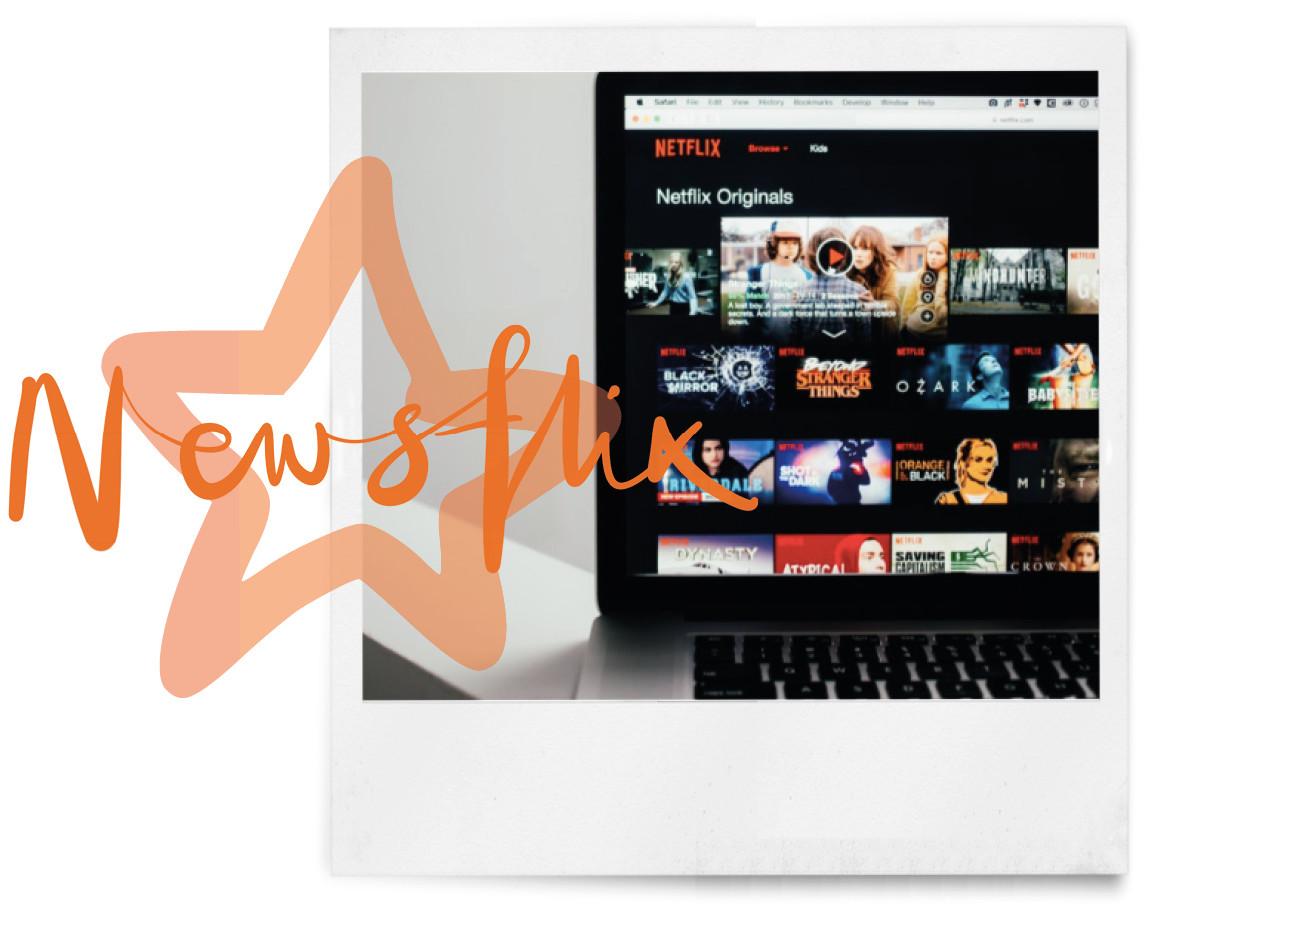 netflix of beeldscherm newsflix ster en polaroid